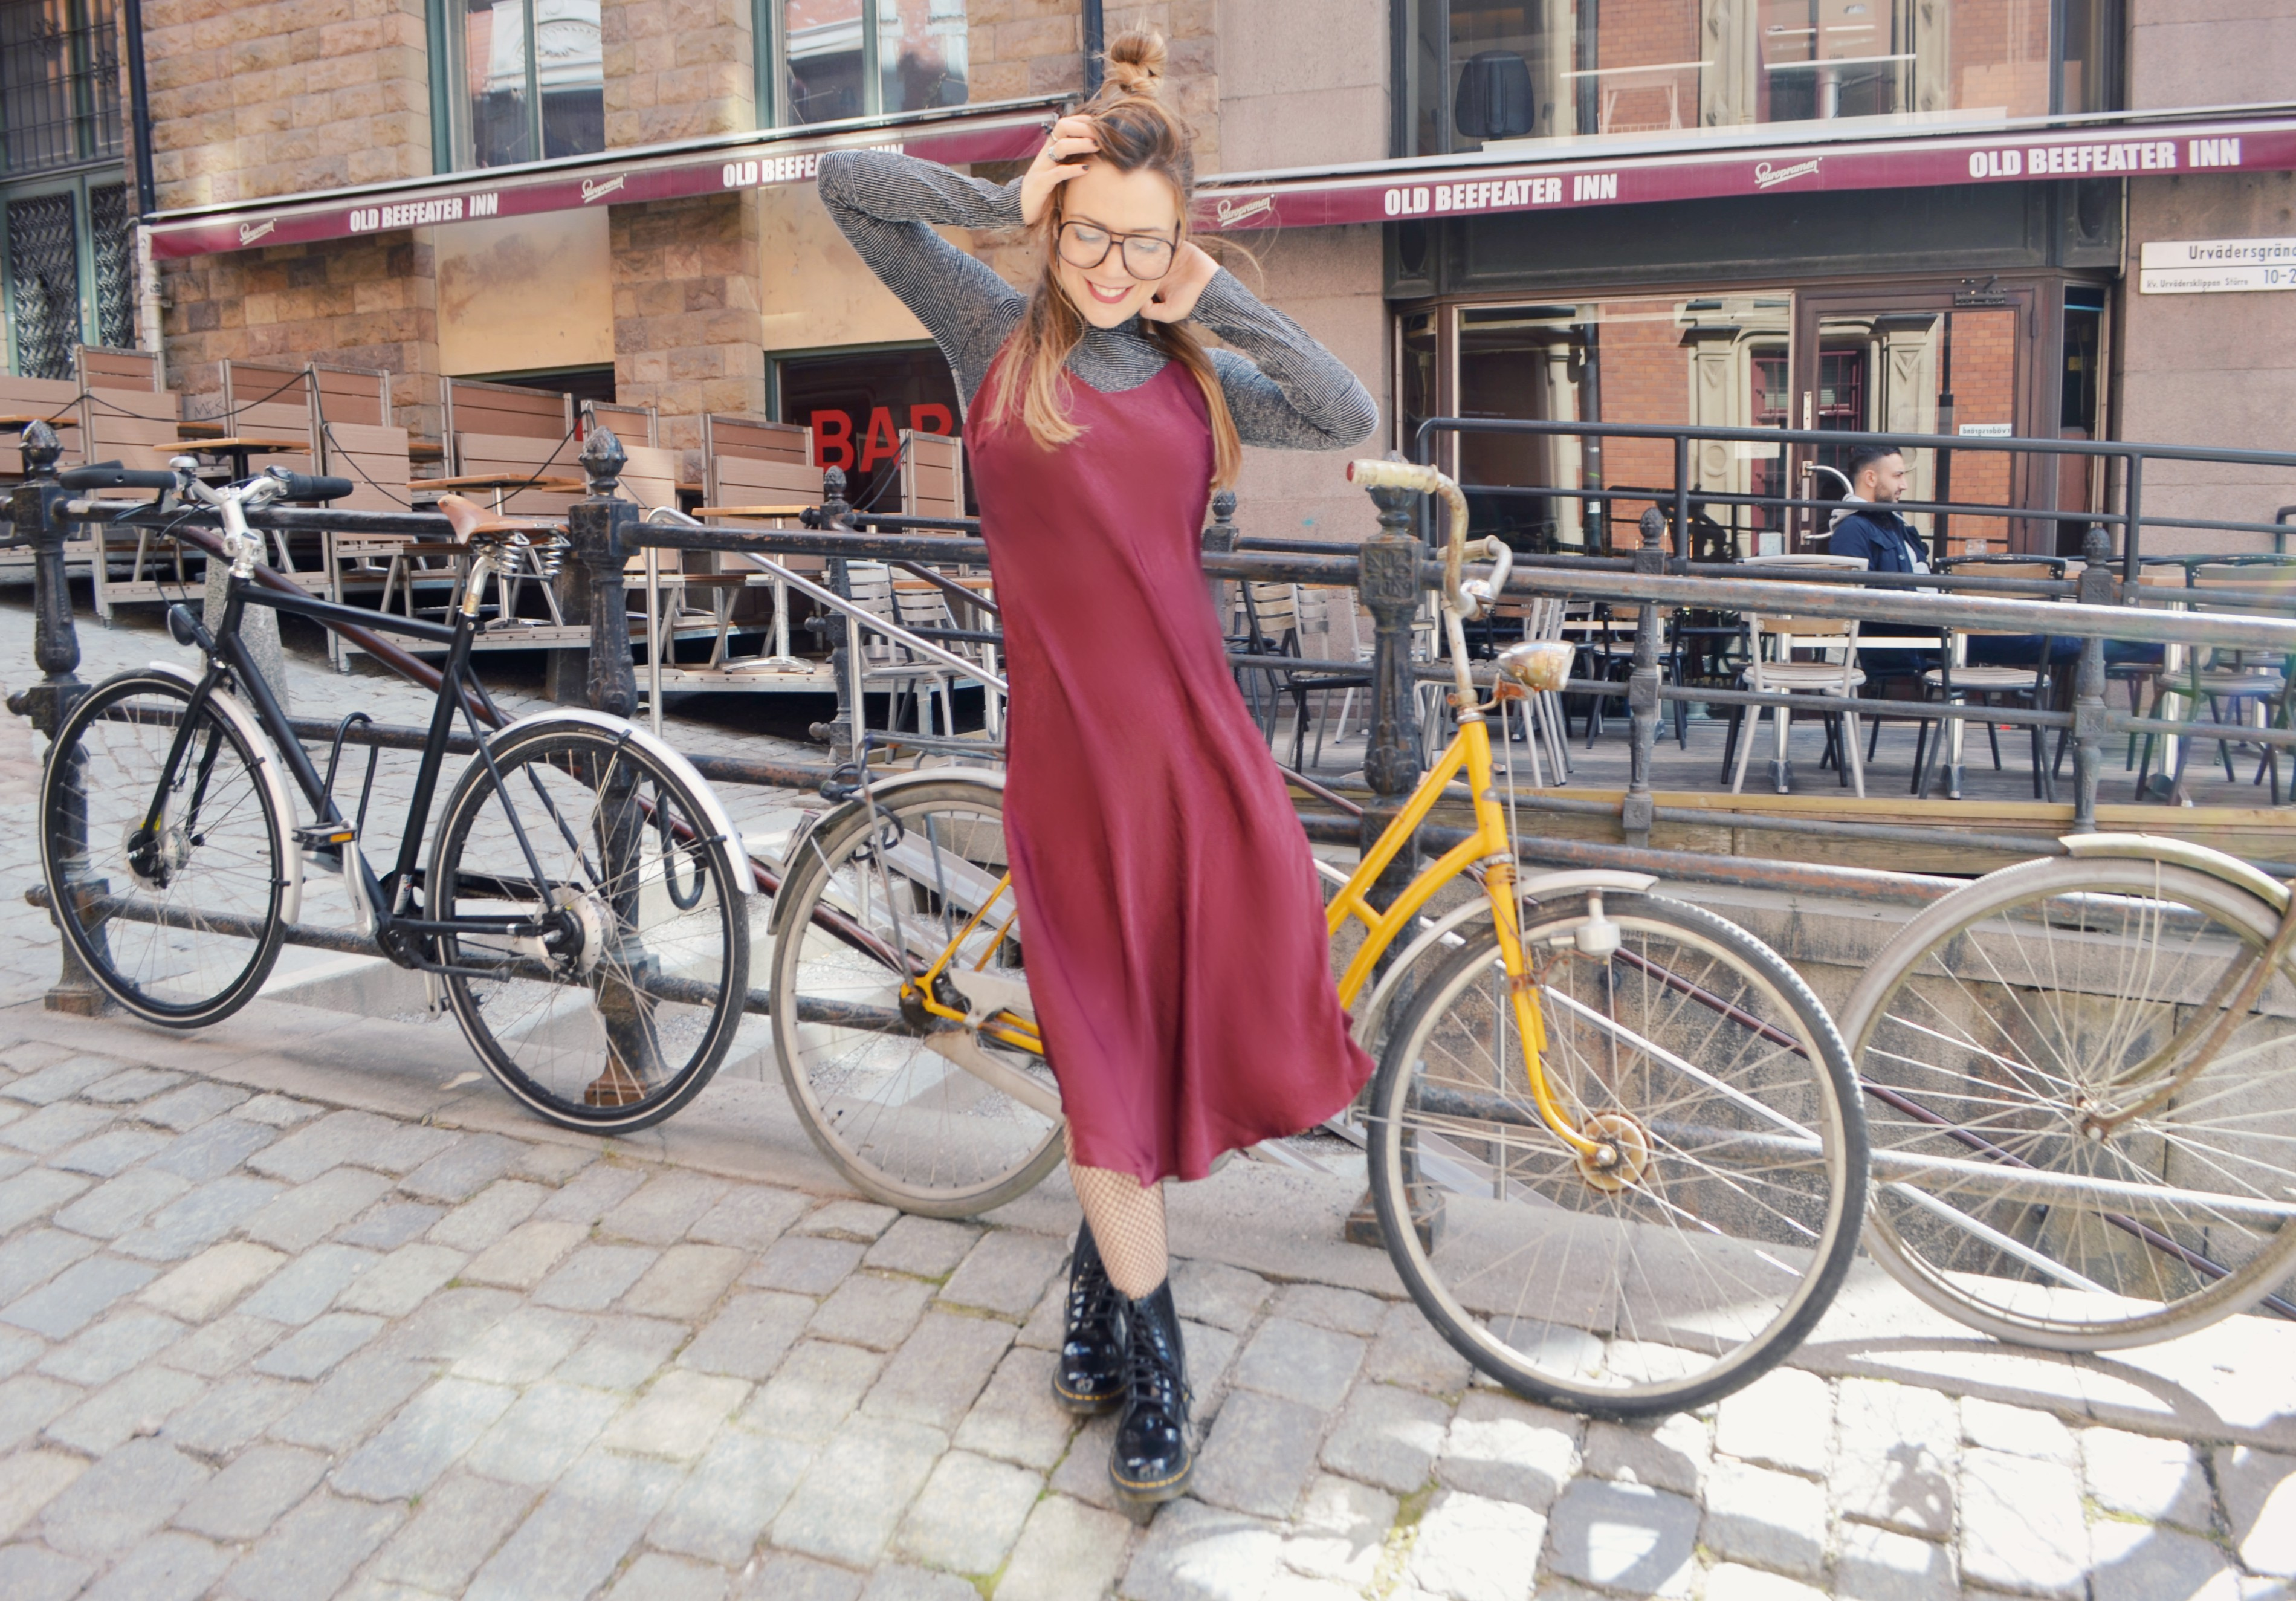 Vestido-burdeos-justfab-drmartens-look-blog-de-moda-ChicAdicta-fashionista-Chic-Adicta-influencer-hipster-girl-PiensaenChic-Piensa-en-Chic